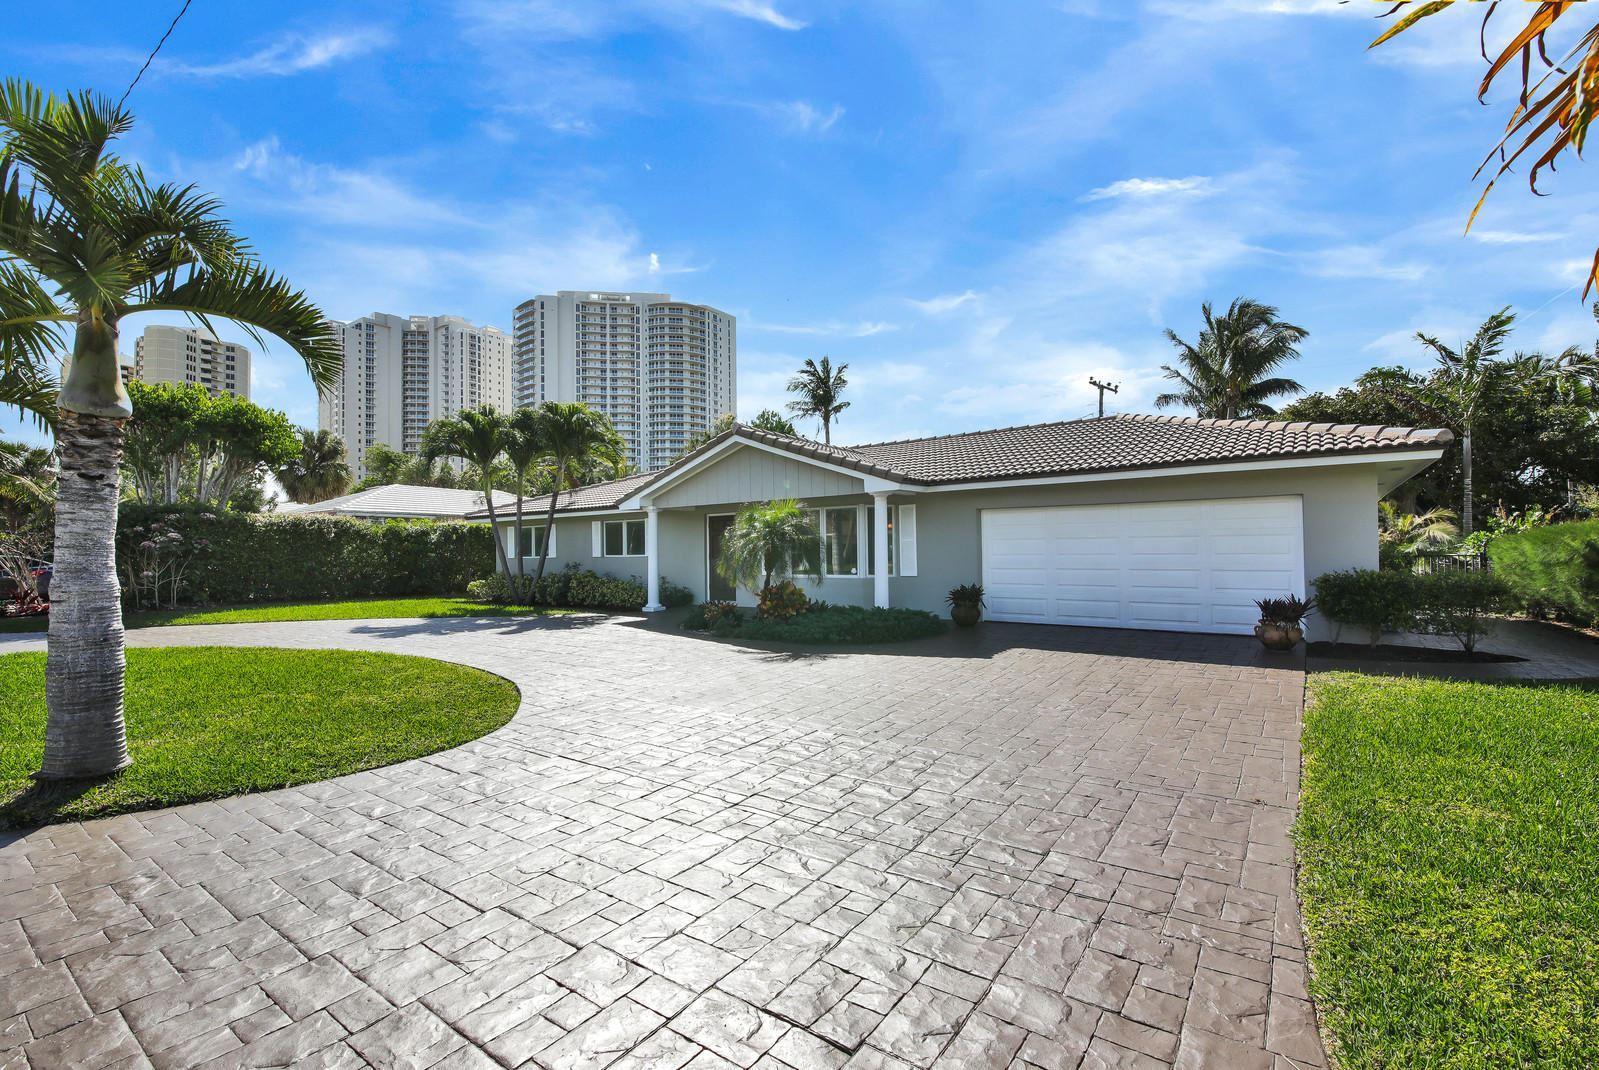 1243 Yacht Harbor Drive, Singer Island, FL 33404 - #: RX-10606218